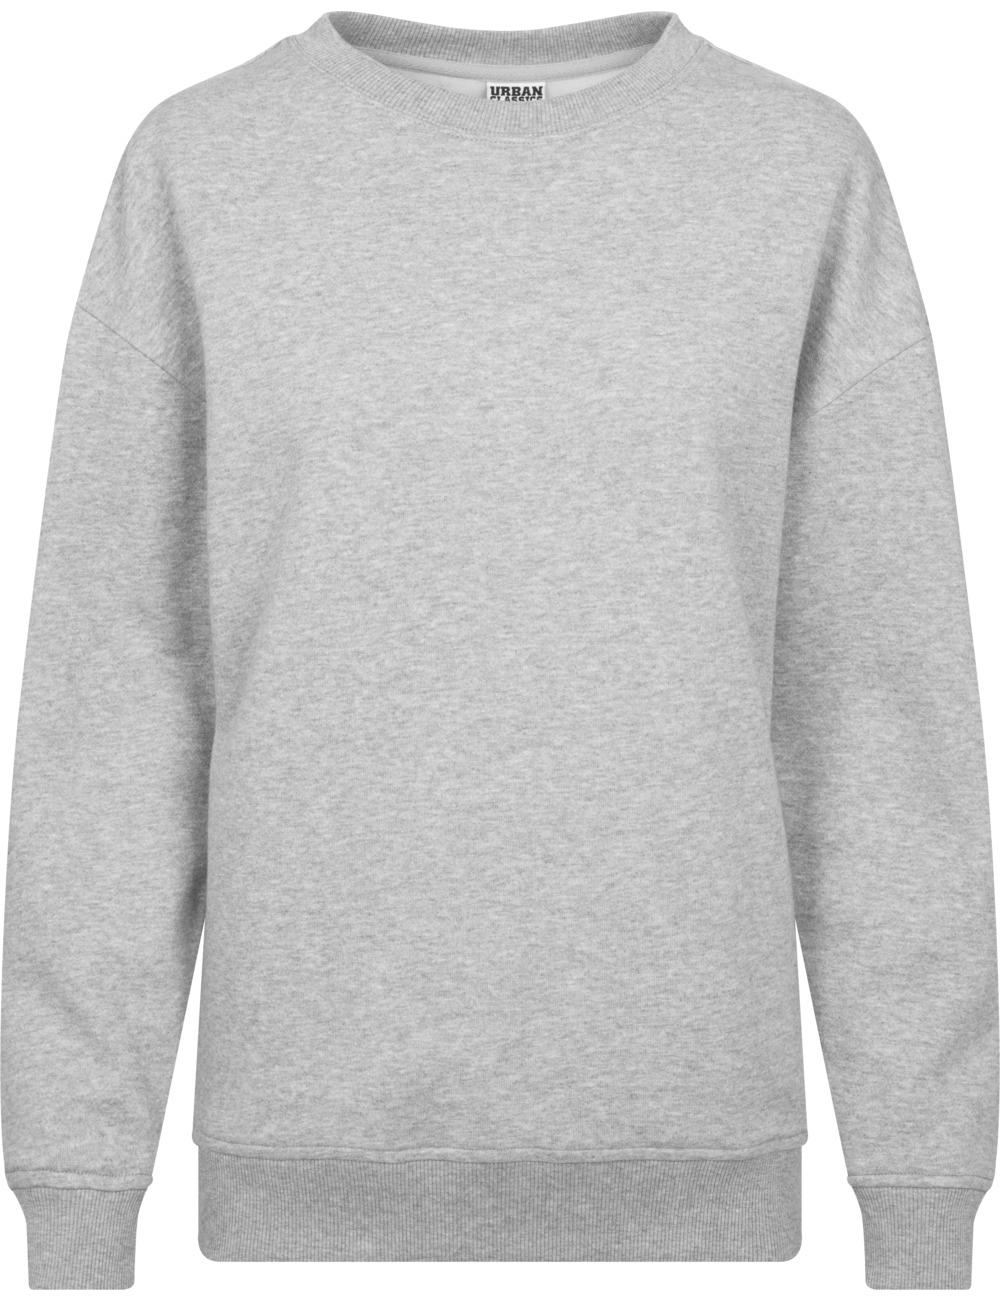 urban-classics-damen-sweater-oversize-crewneck